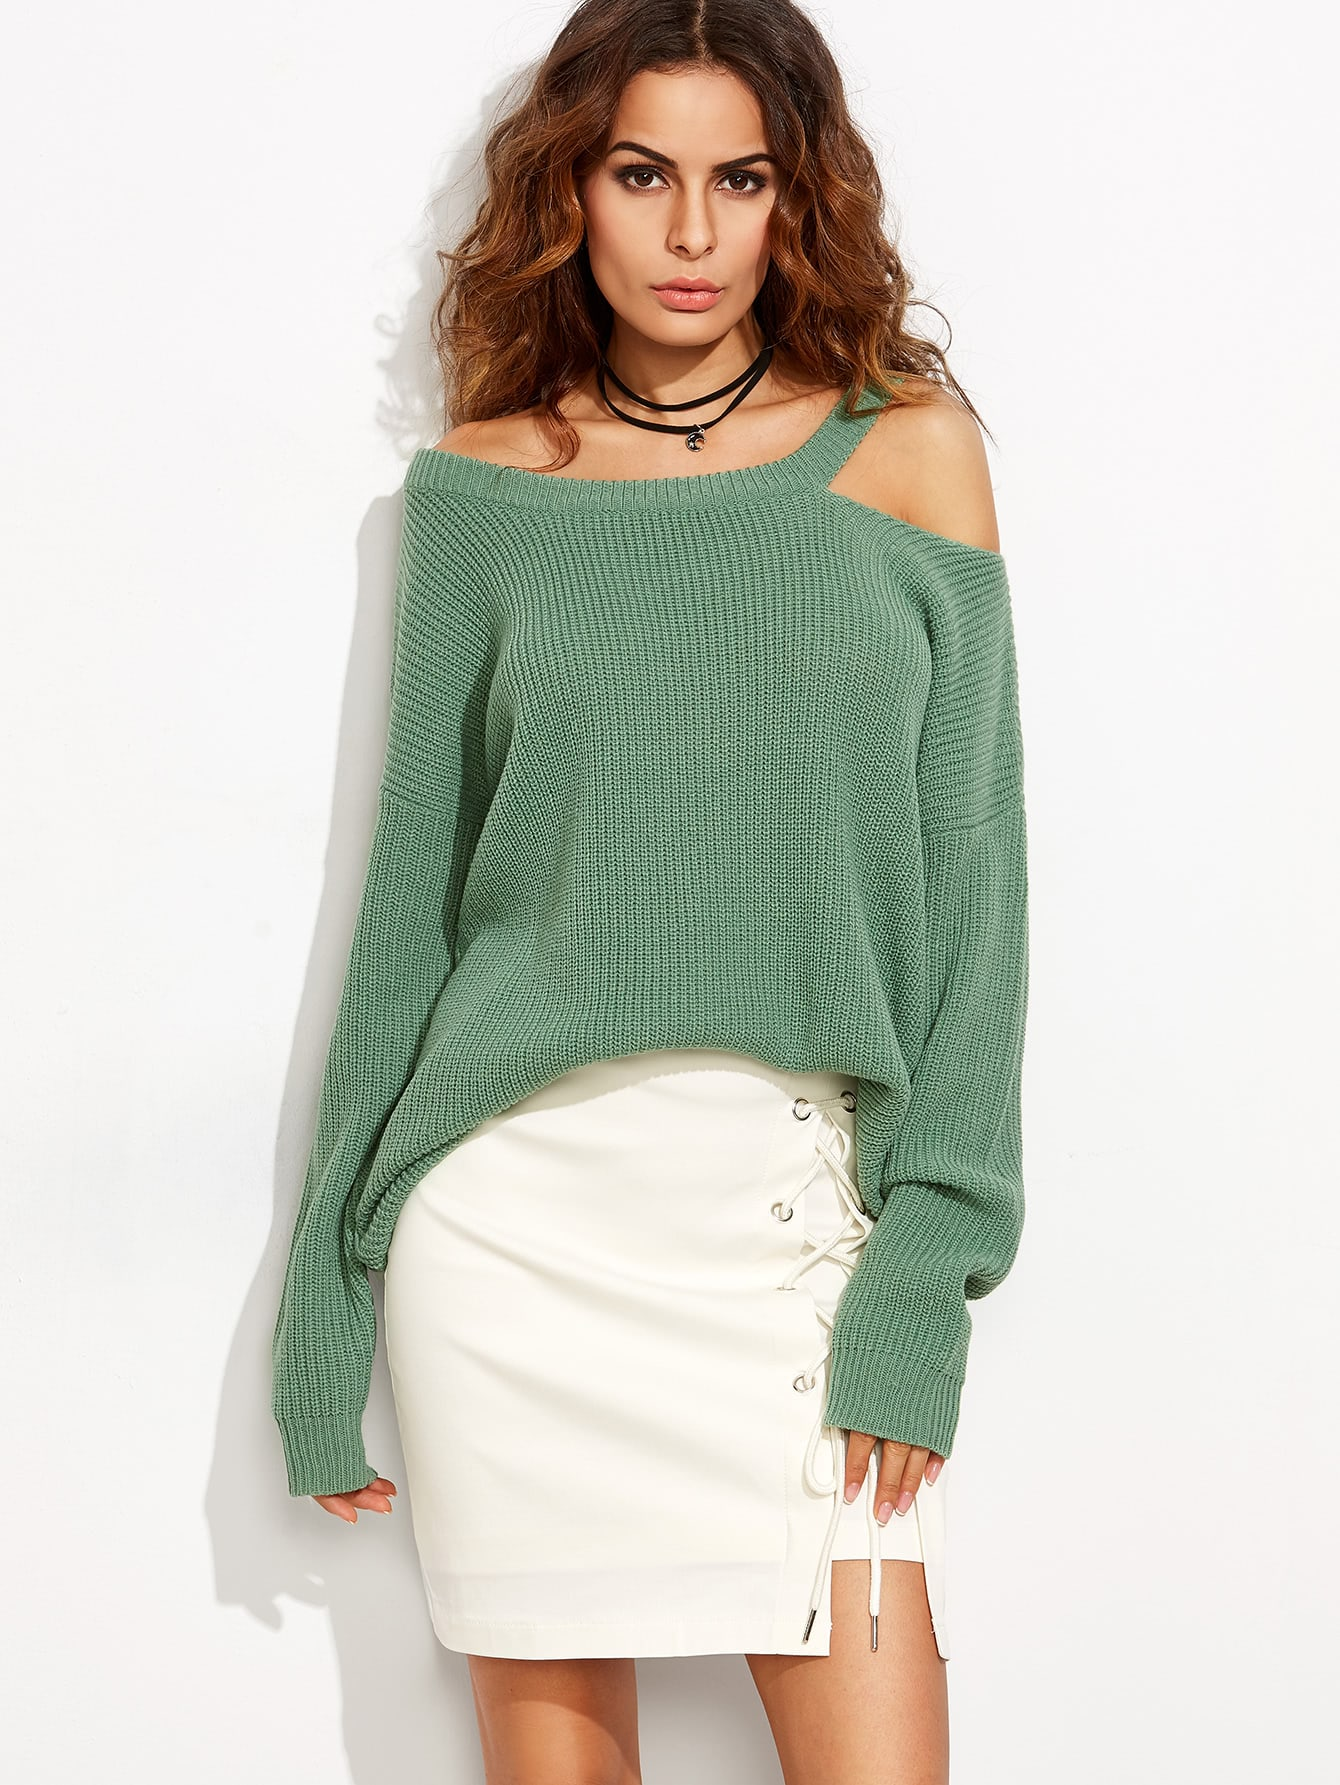 Asymmetric Dropped Shoulder Cutout Sweater cutout neck dropped shoulder tee